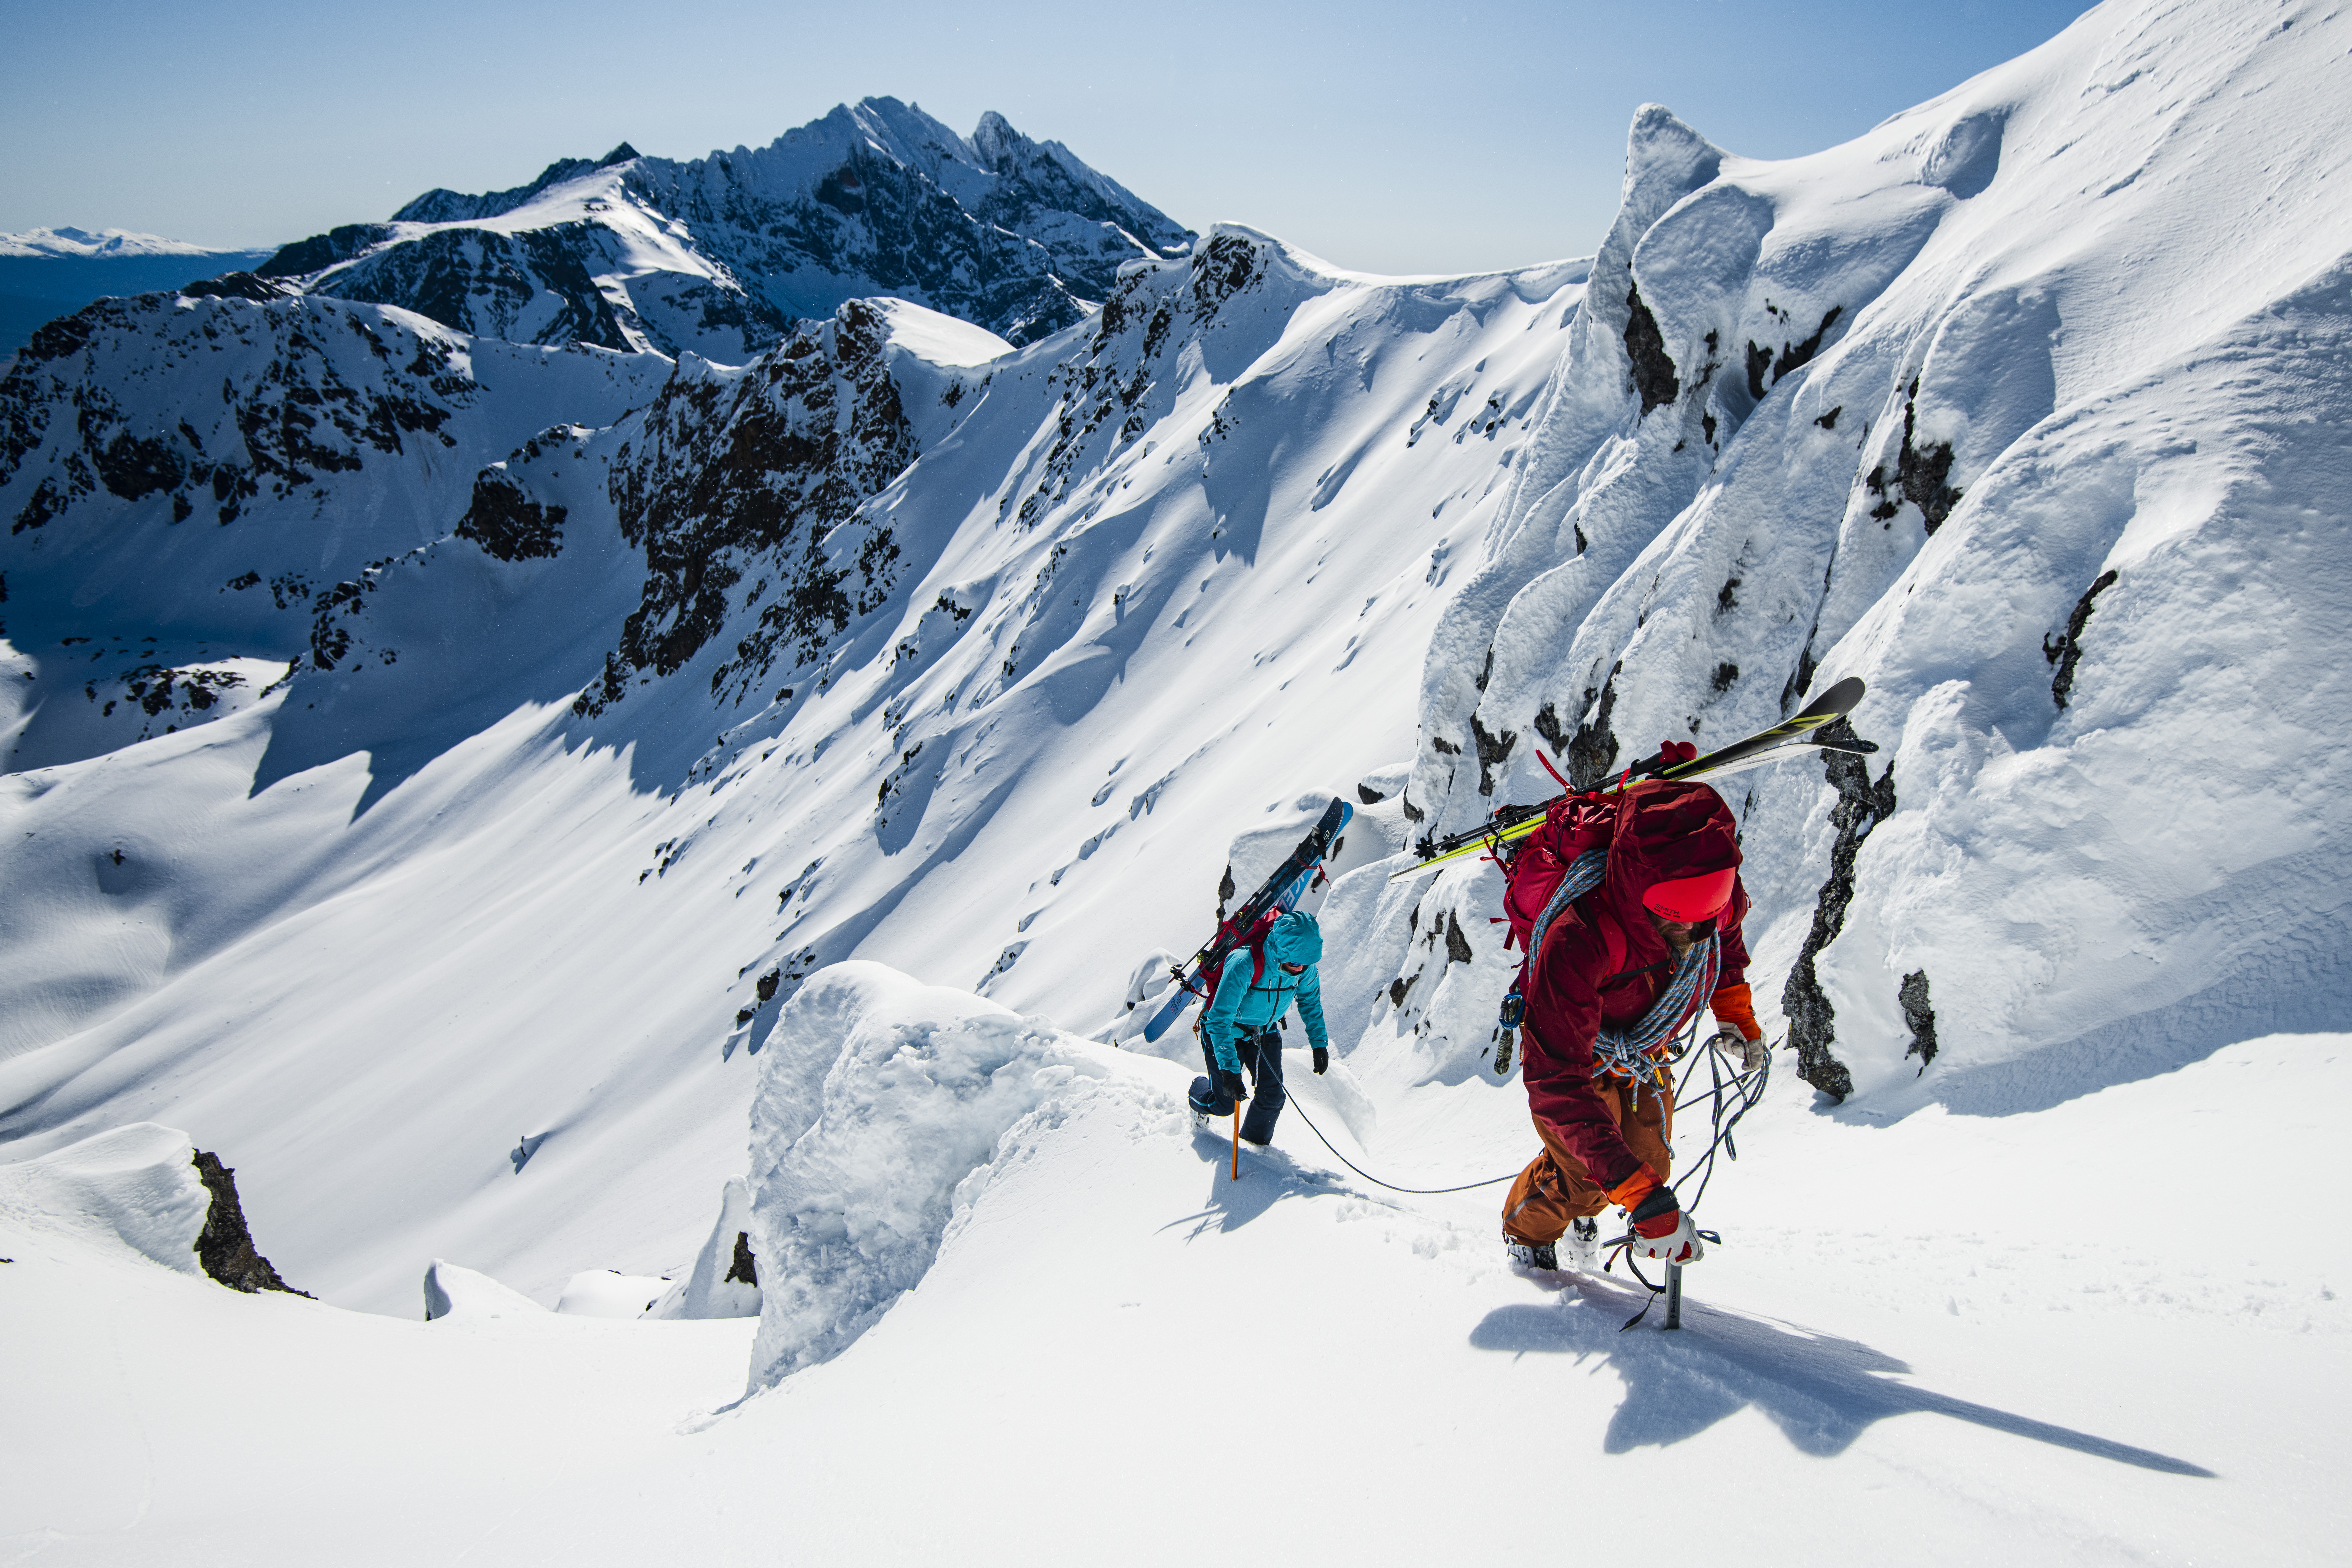 Ski_mountaineering_rab